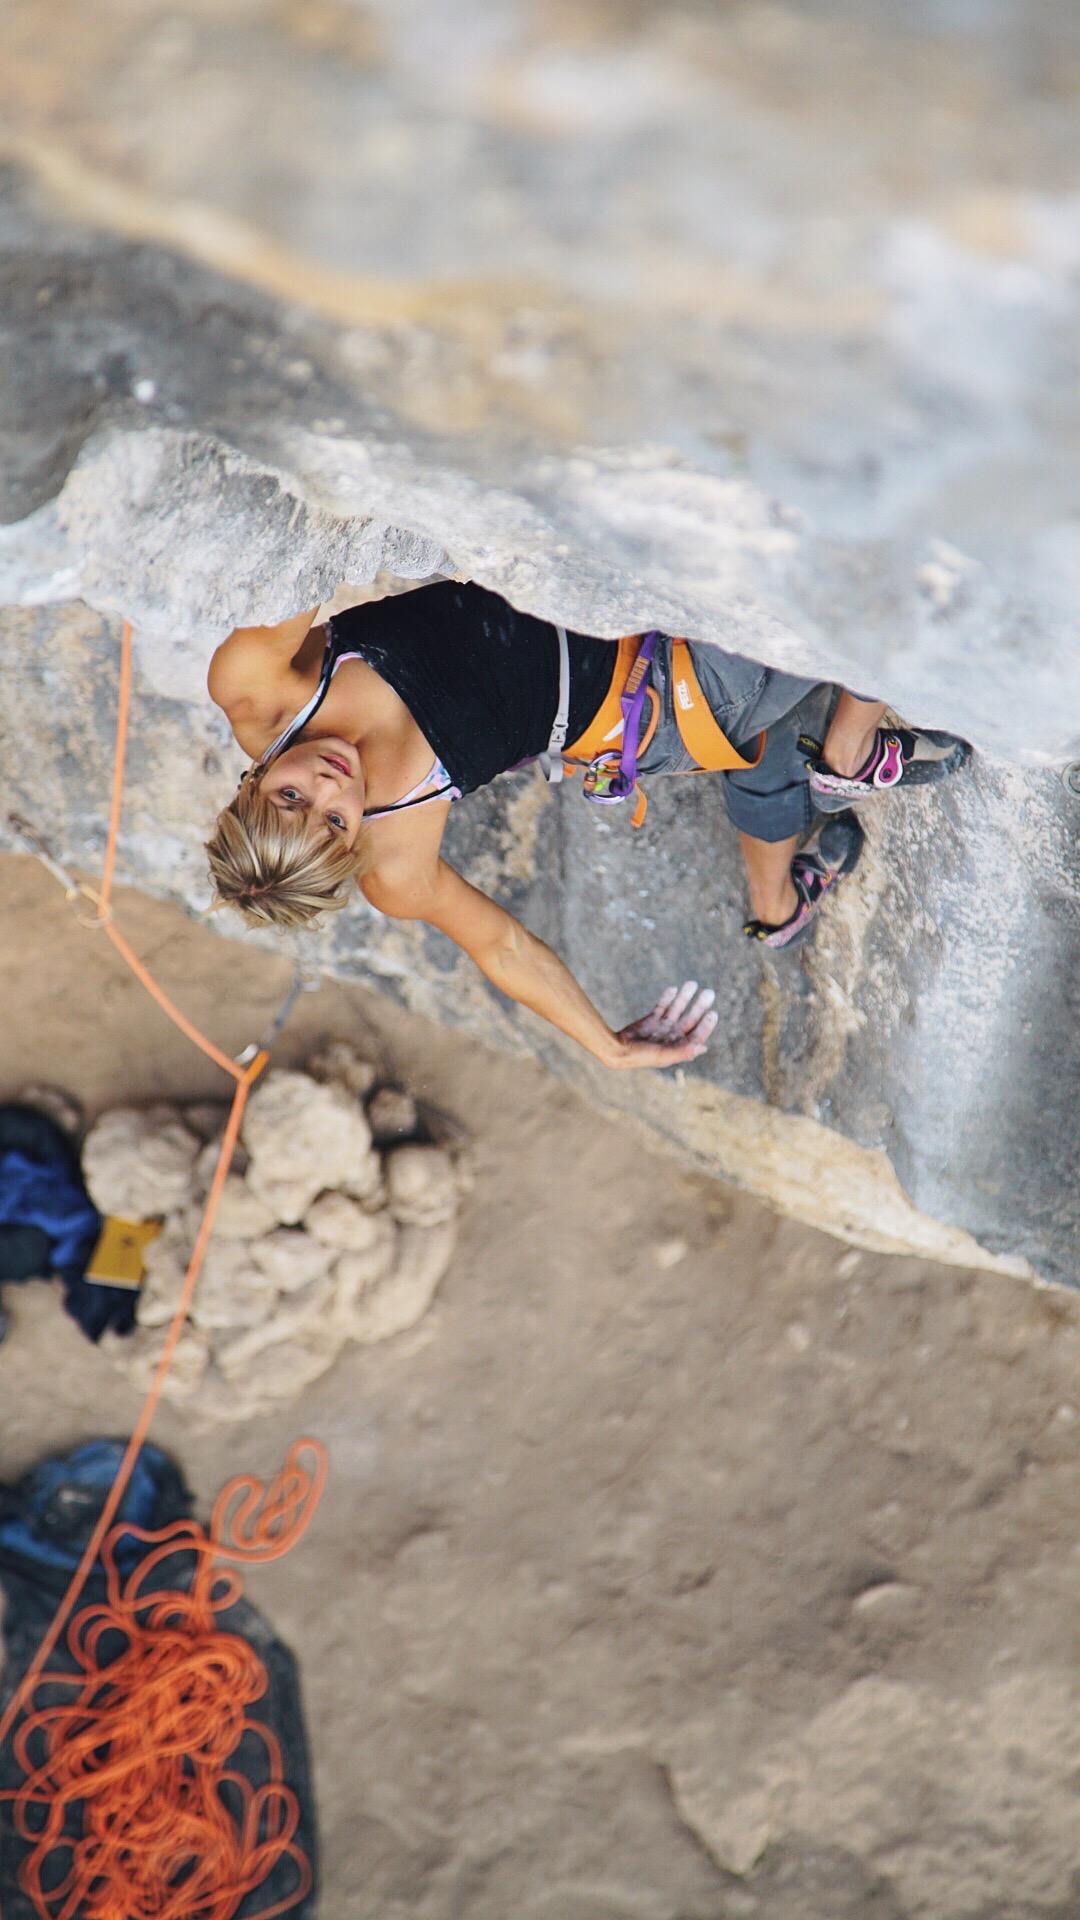 Toni Canneloni, 8a+, Margalef, Spain